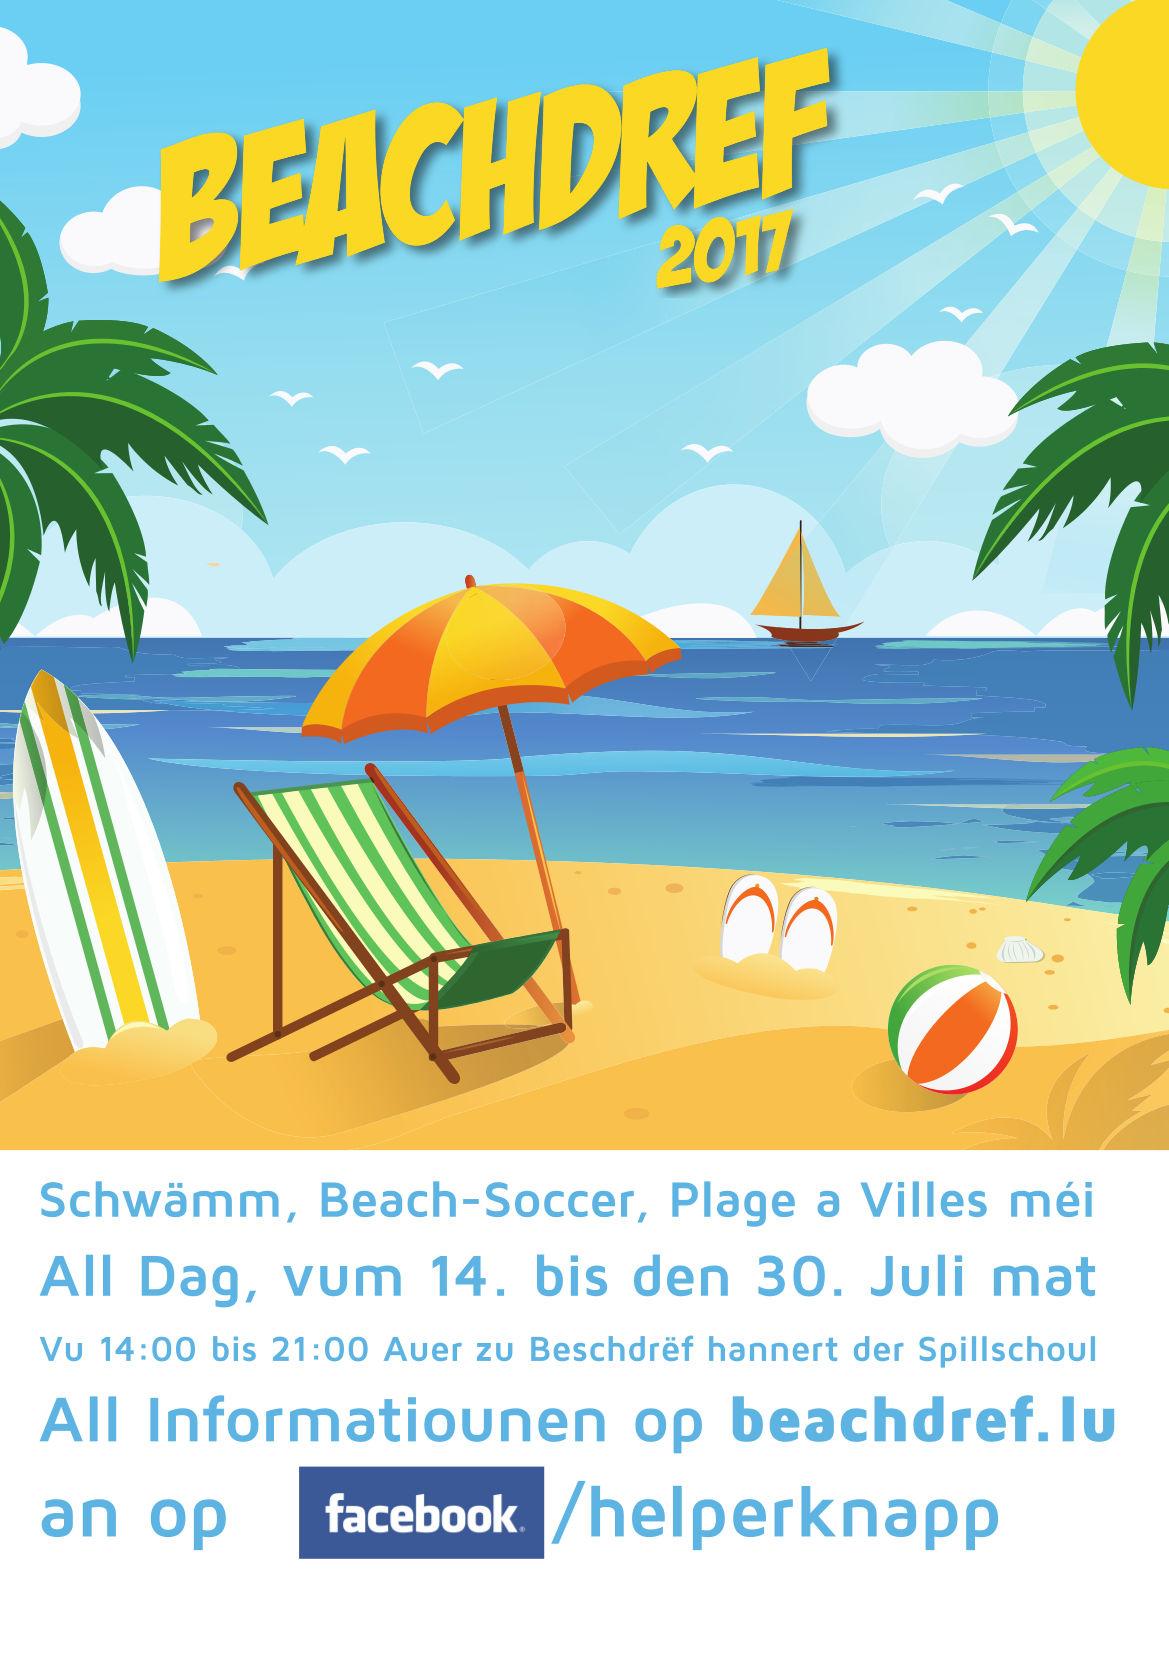 Summerjob – Beachdref 2017